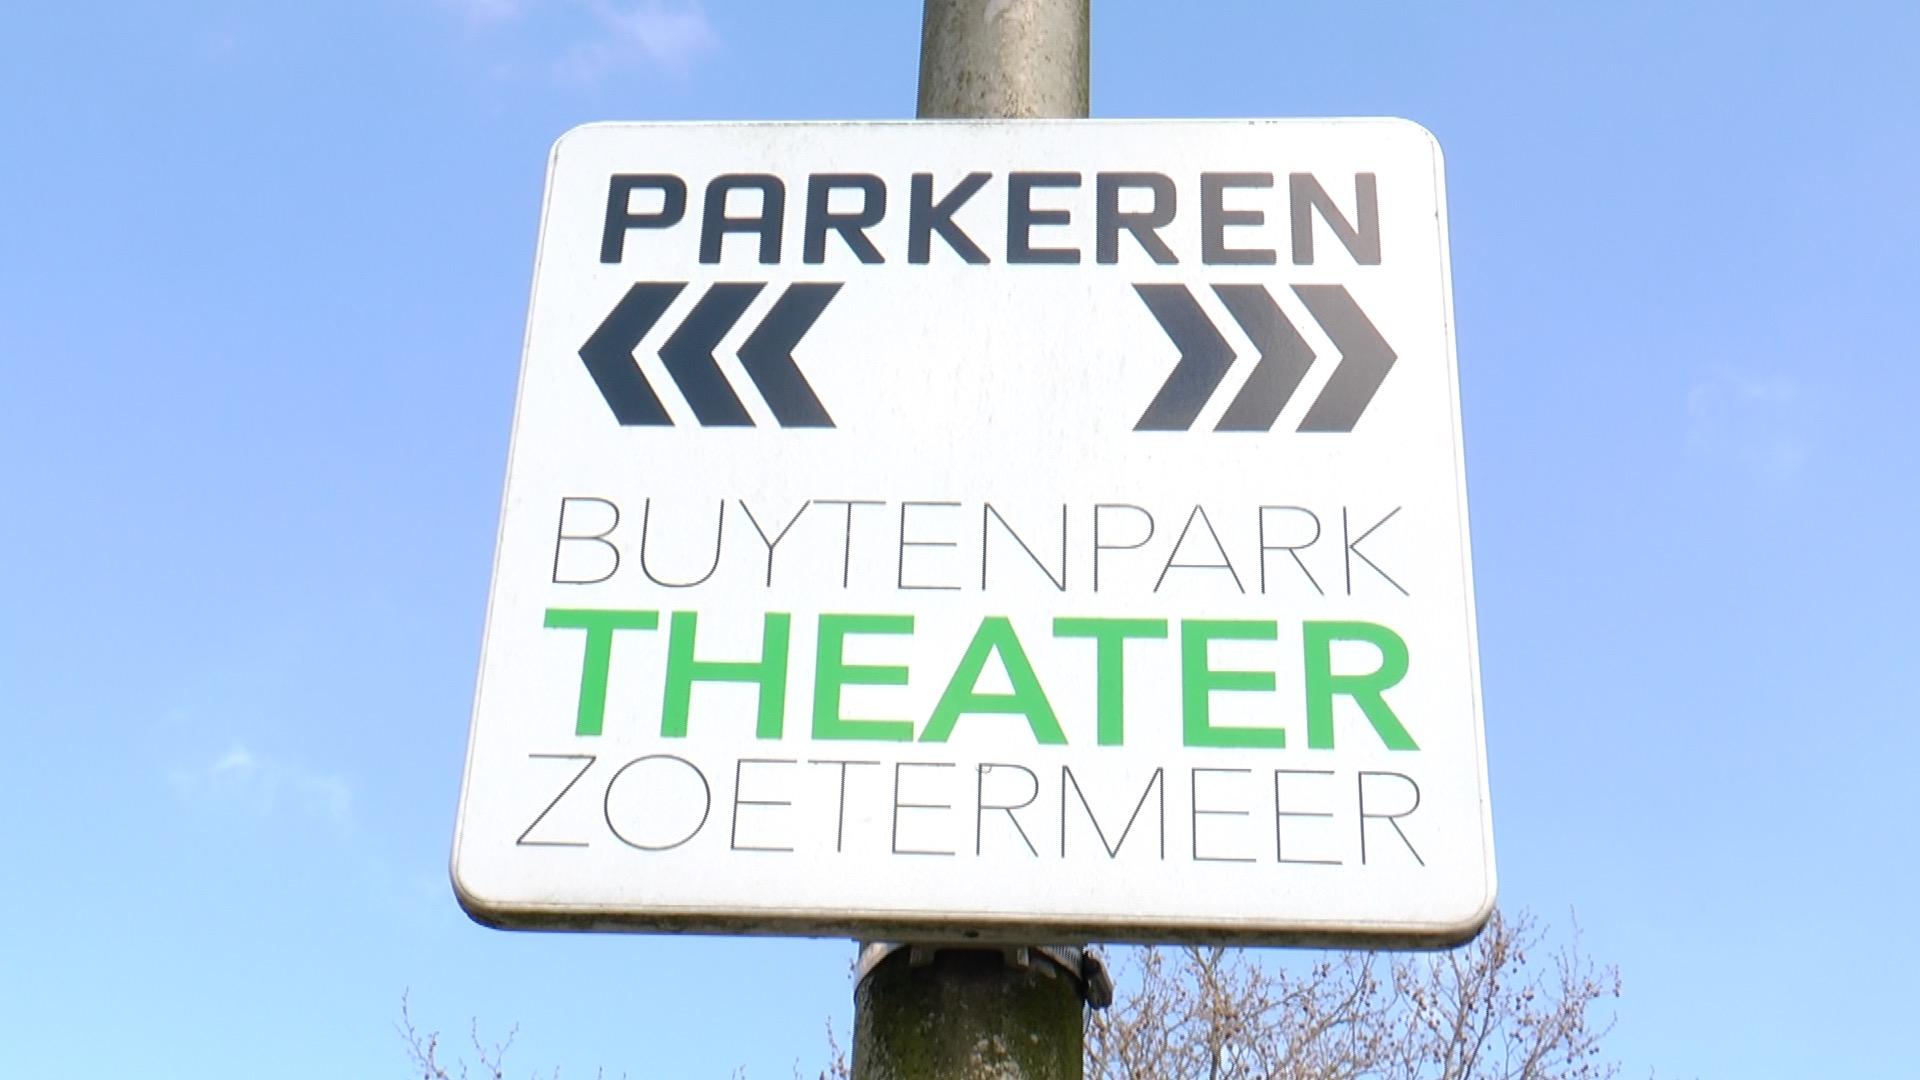 Gemeente Zoetermeer geeft toch subsidie voor het Buytenpark theater